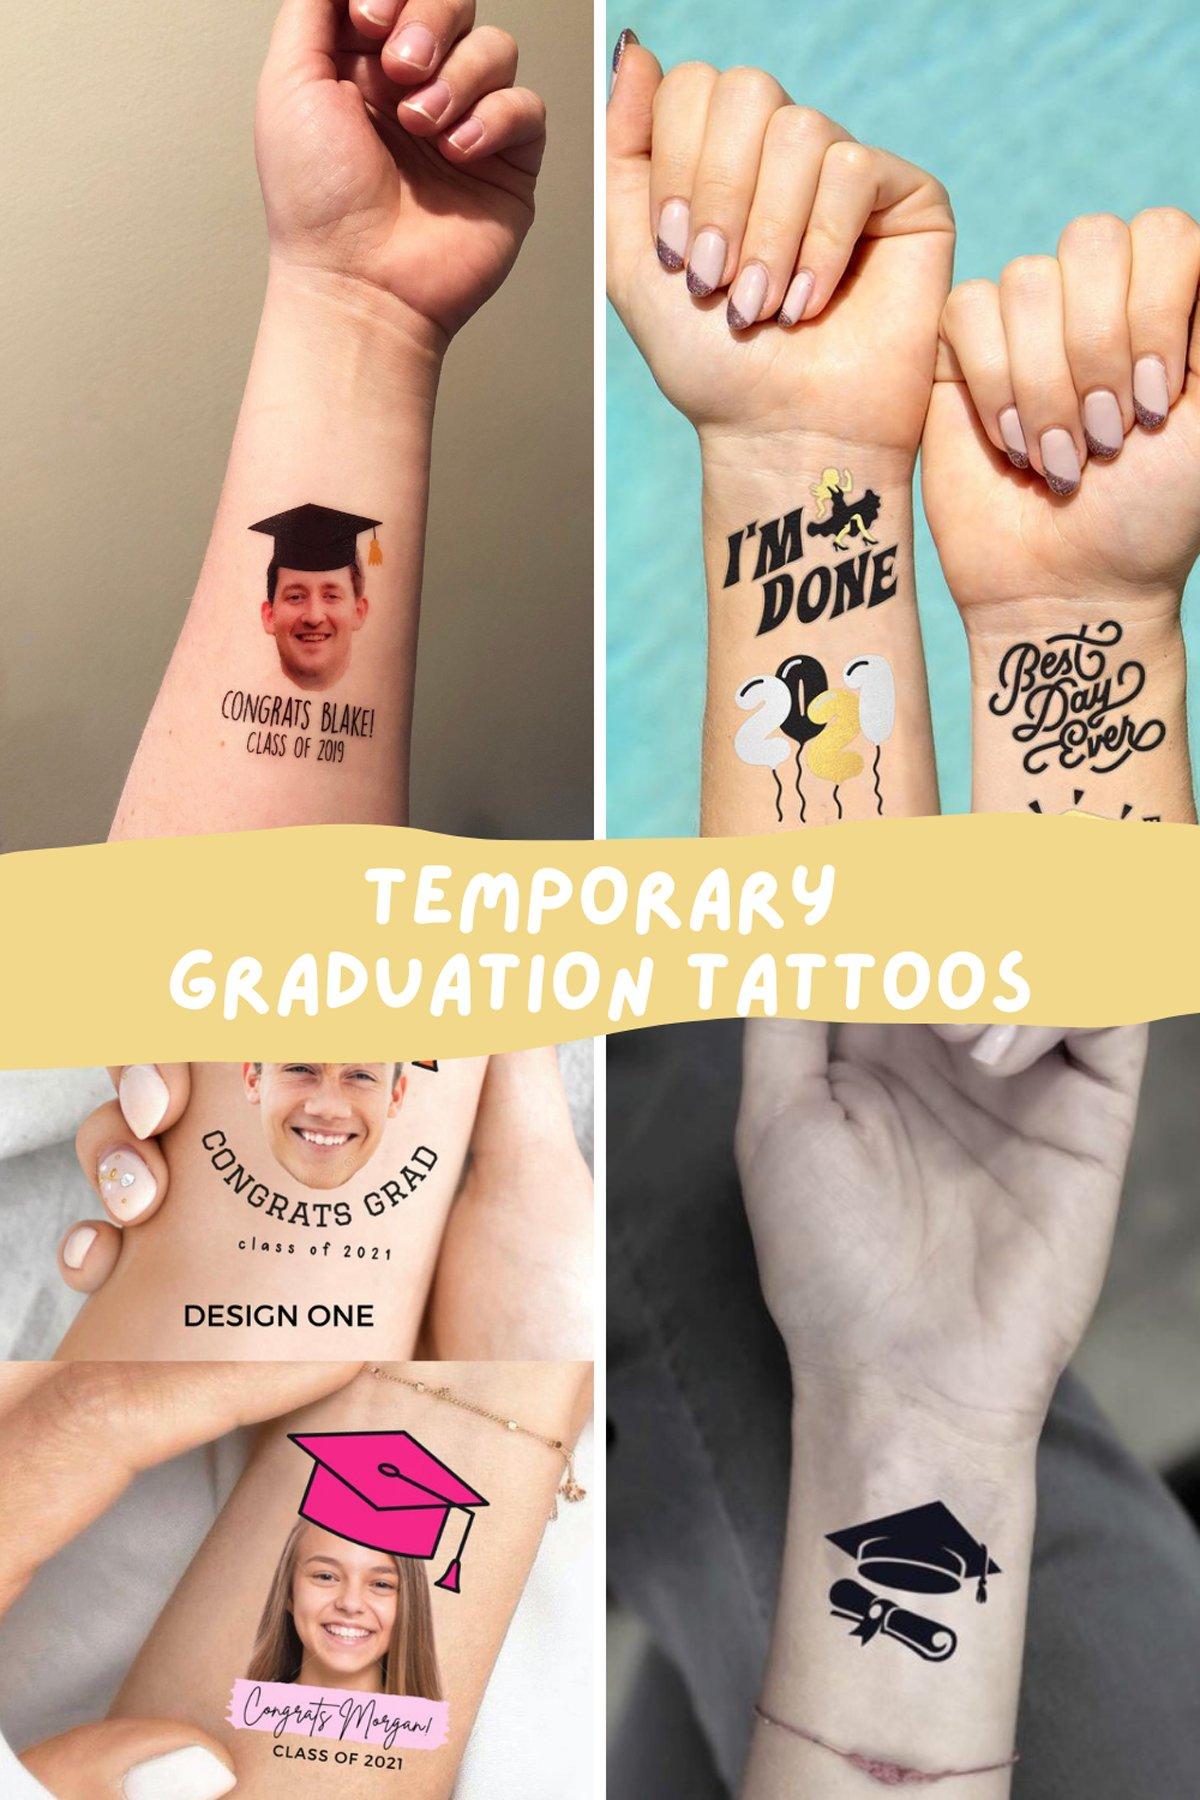 Temporary Graduation Tattoos